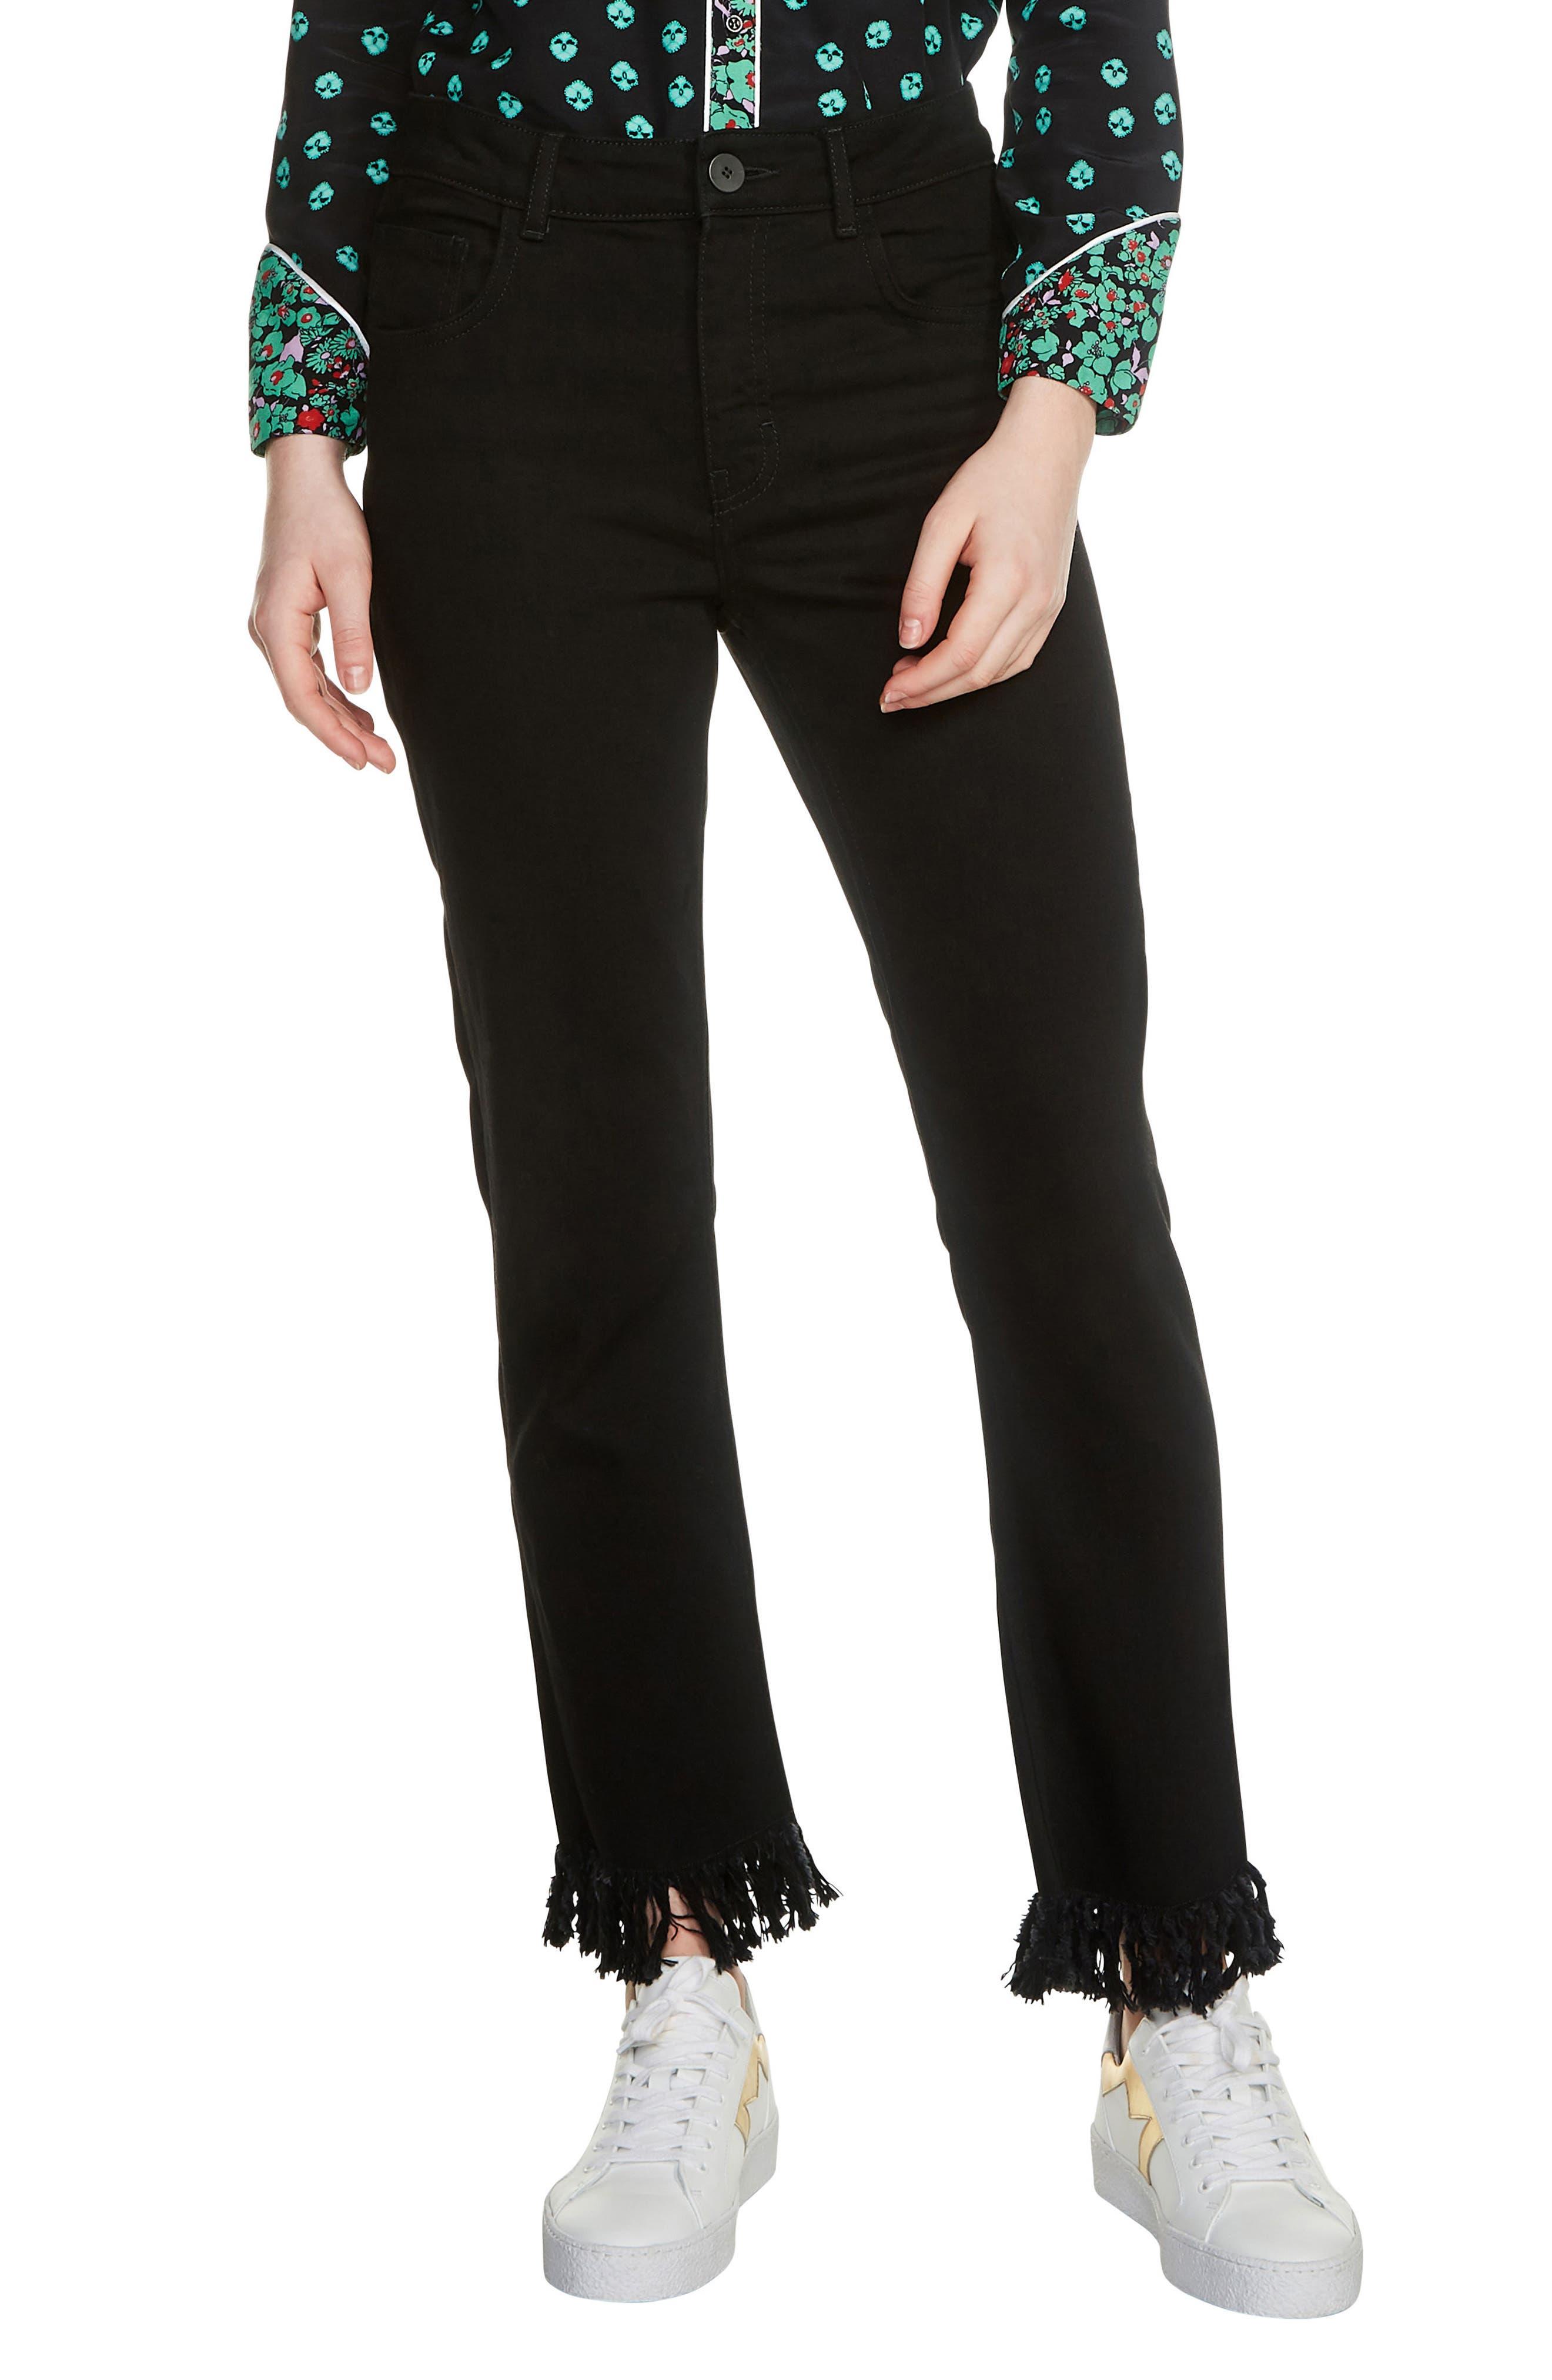 Panako Fringe Hem Jeans,                         Main,                         color, Black 210